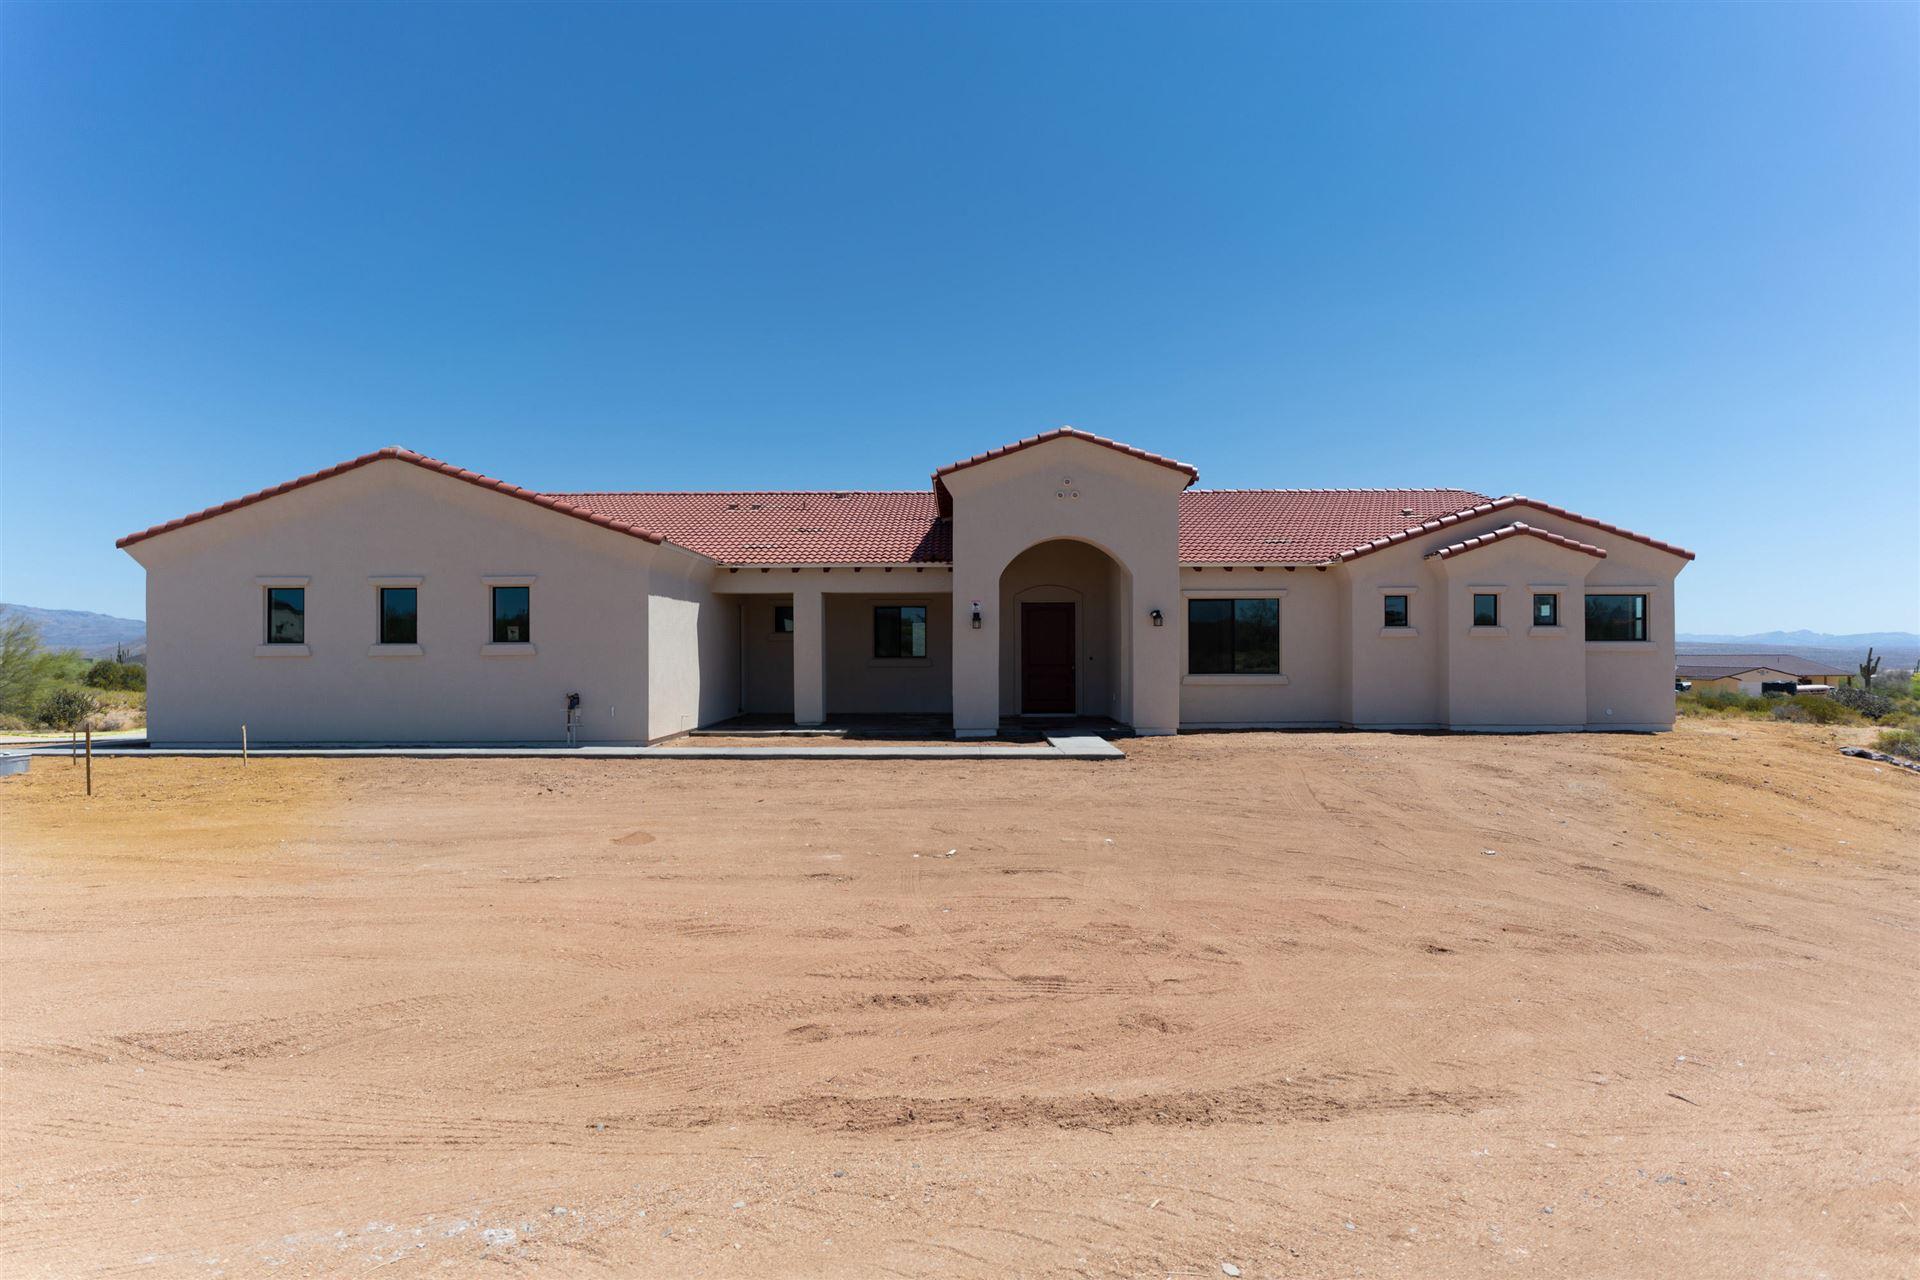 Photo of 17305 E Windstone Trail, Rio Verde, AZ 85263 (MLS # 6216127)